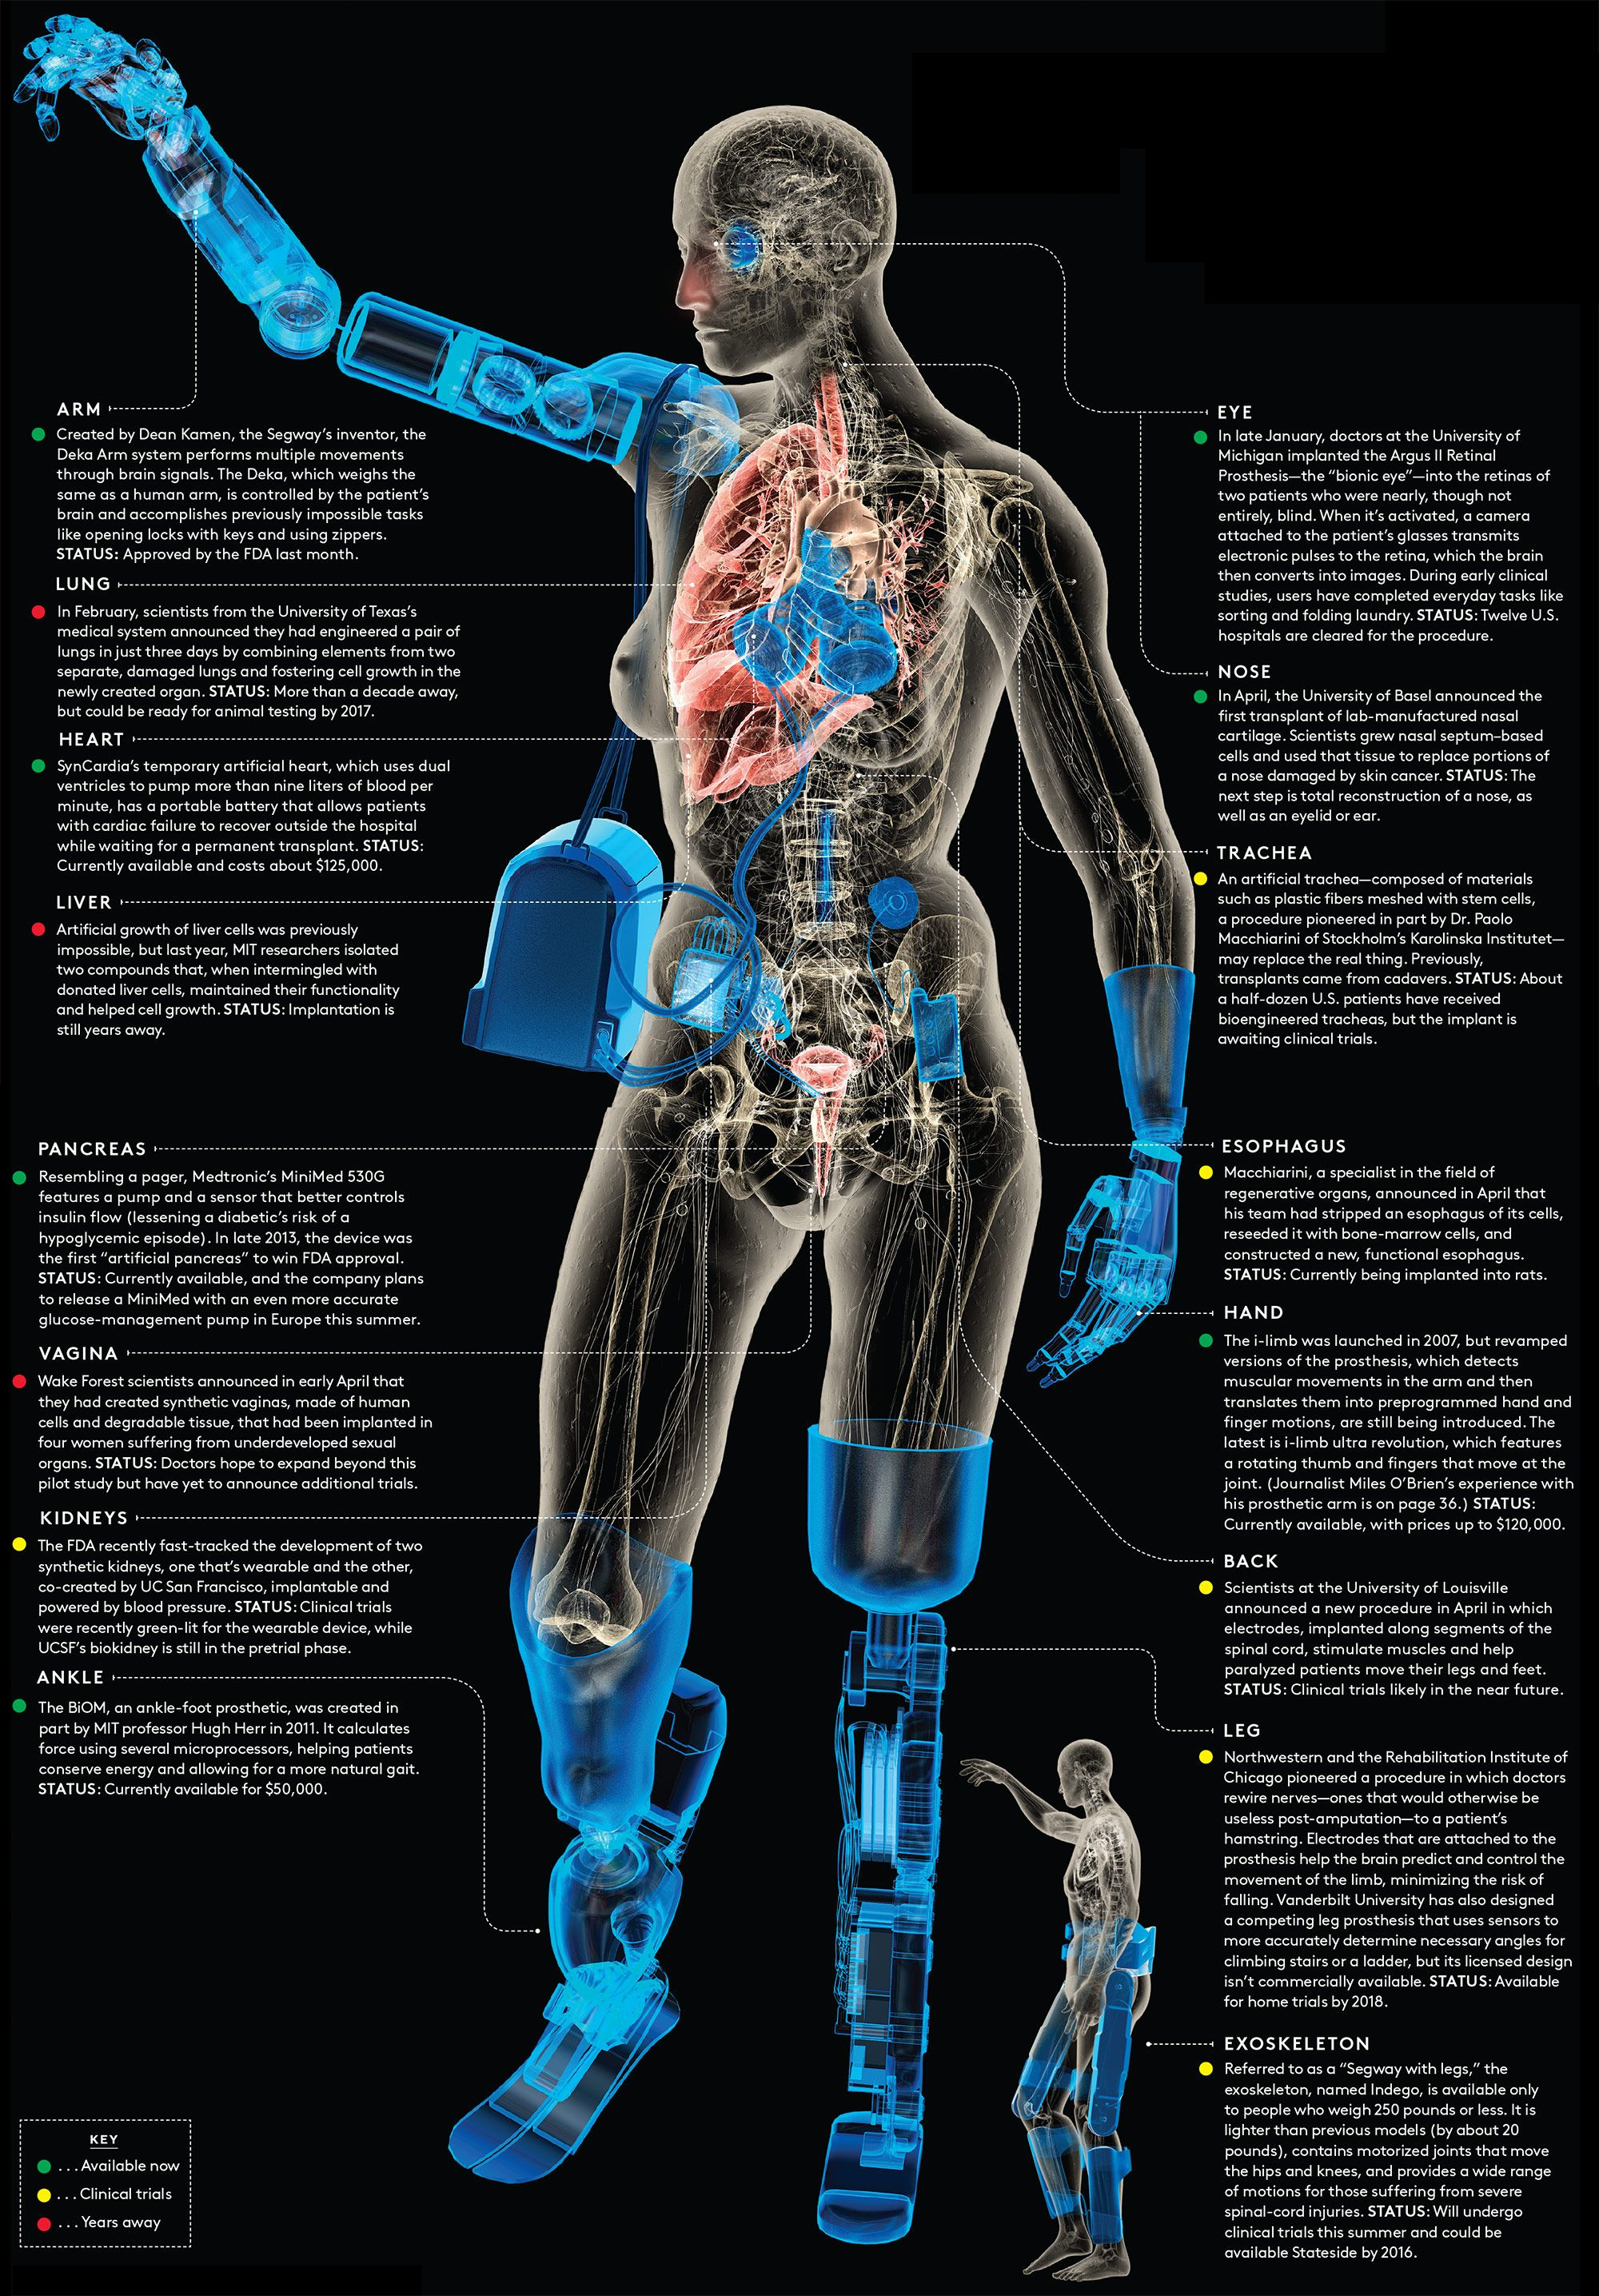 Pin On Bionics Prosthetics Robotics